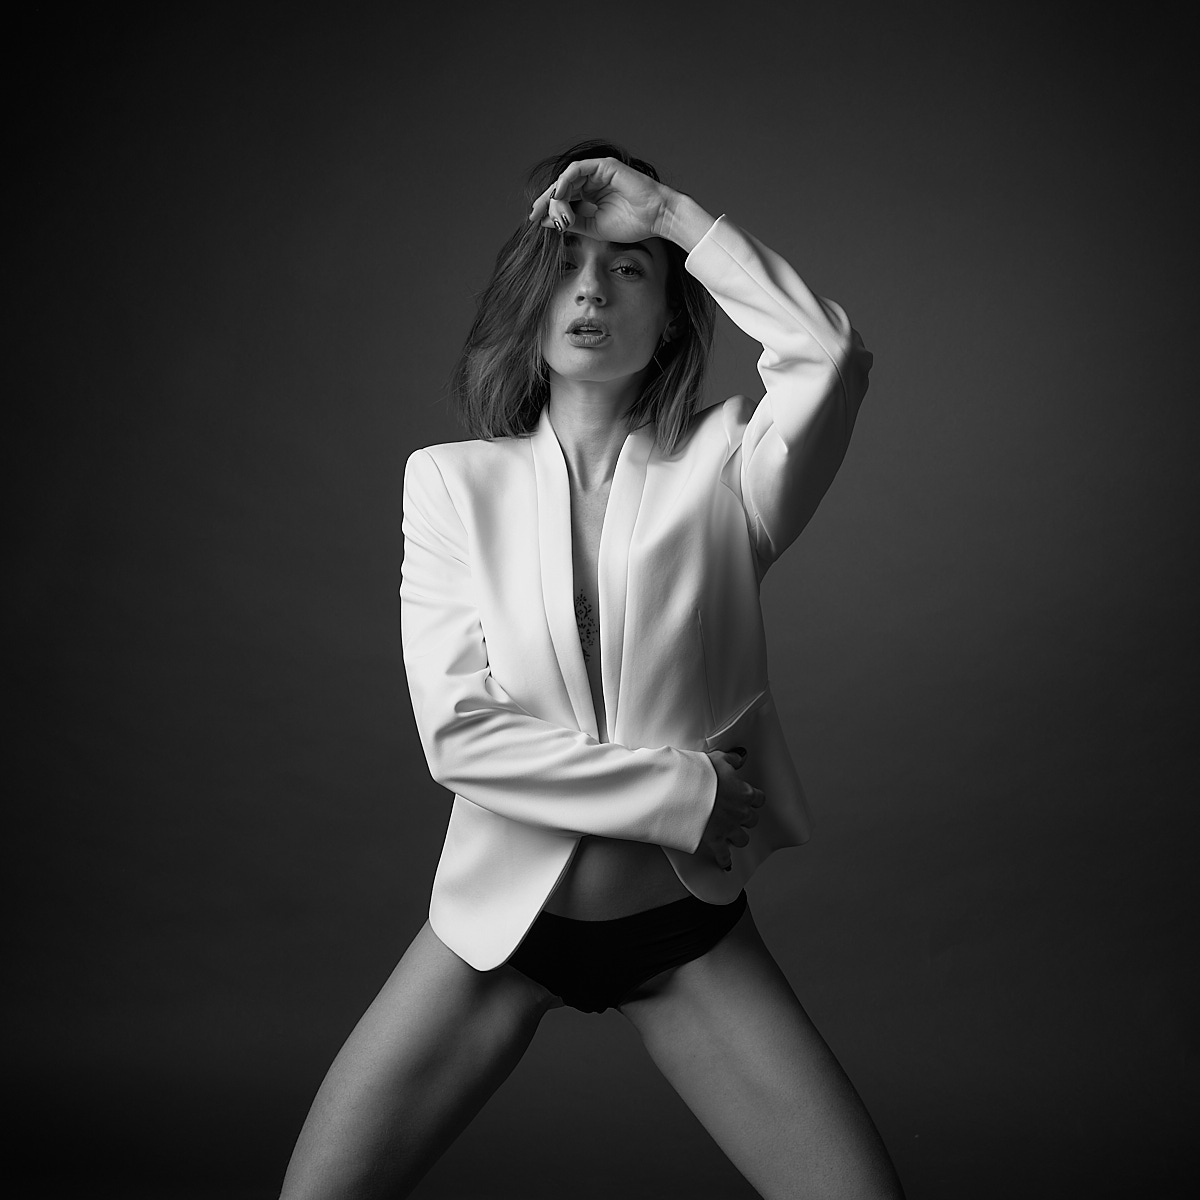 Femme veste blanche